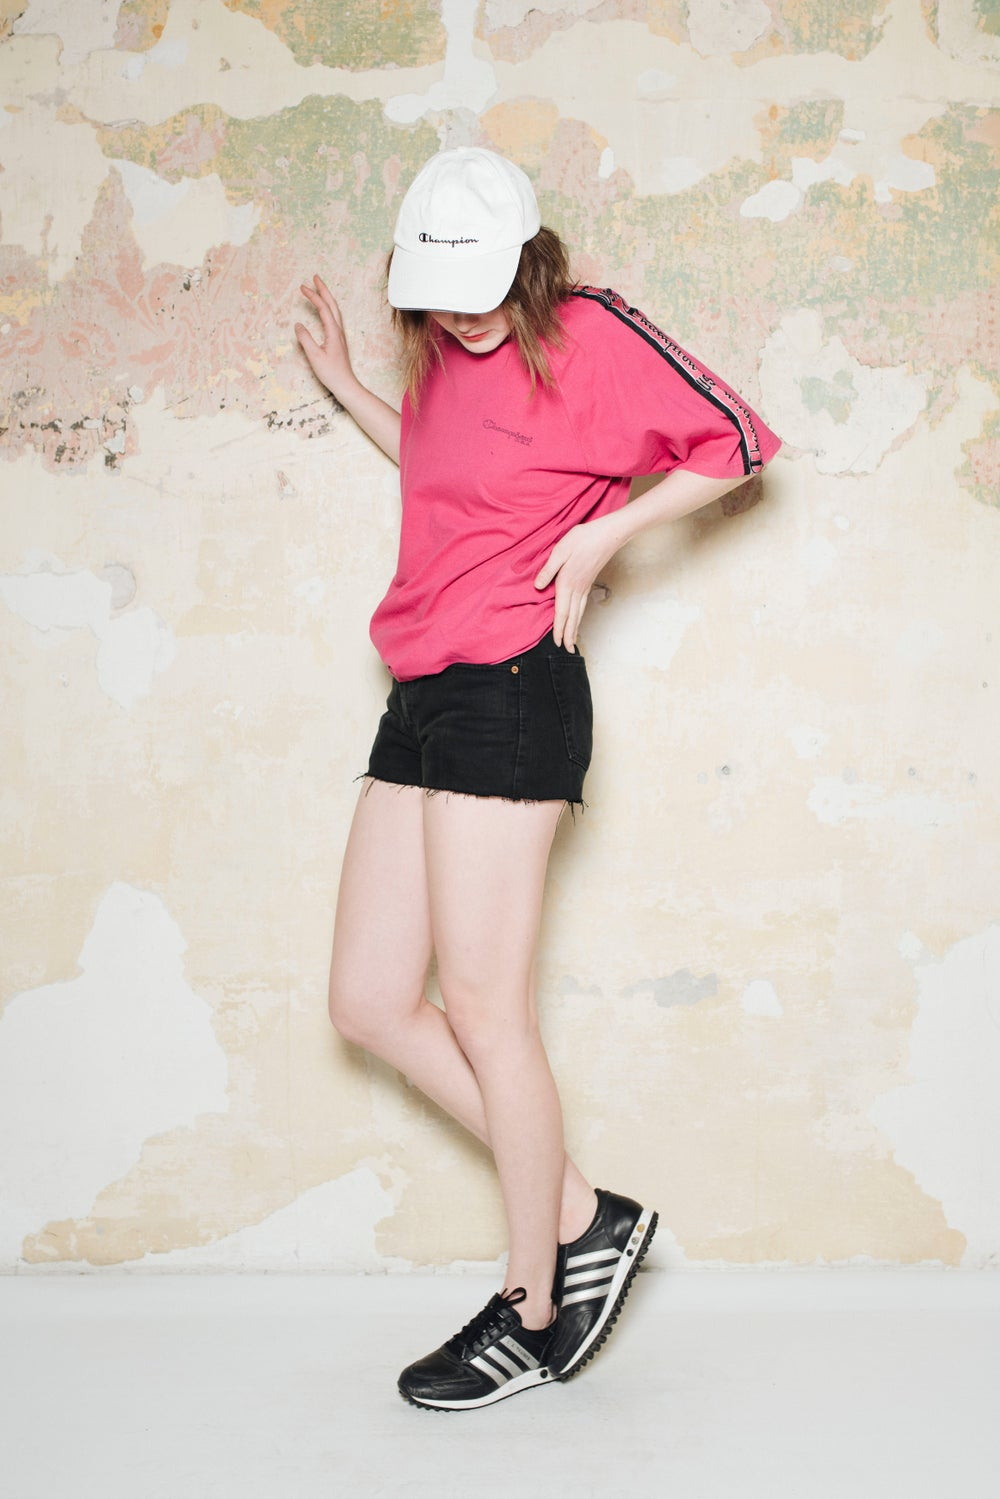 Image of Champion Pink 90's Tshirt